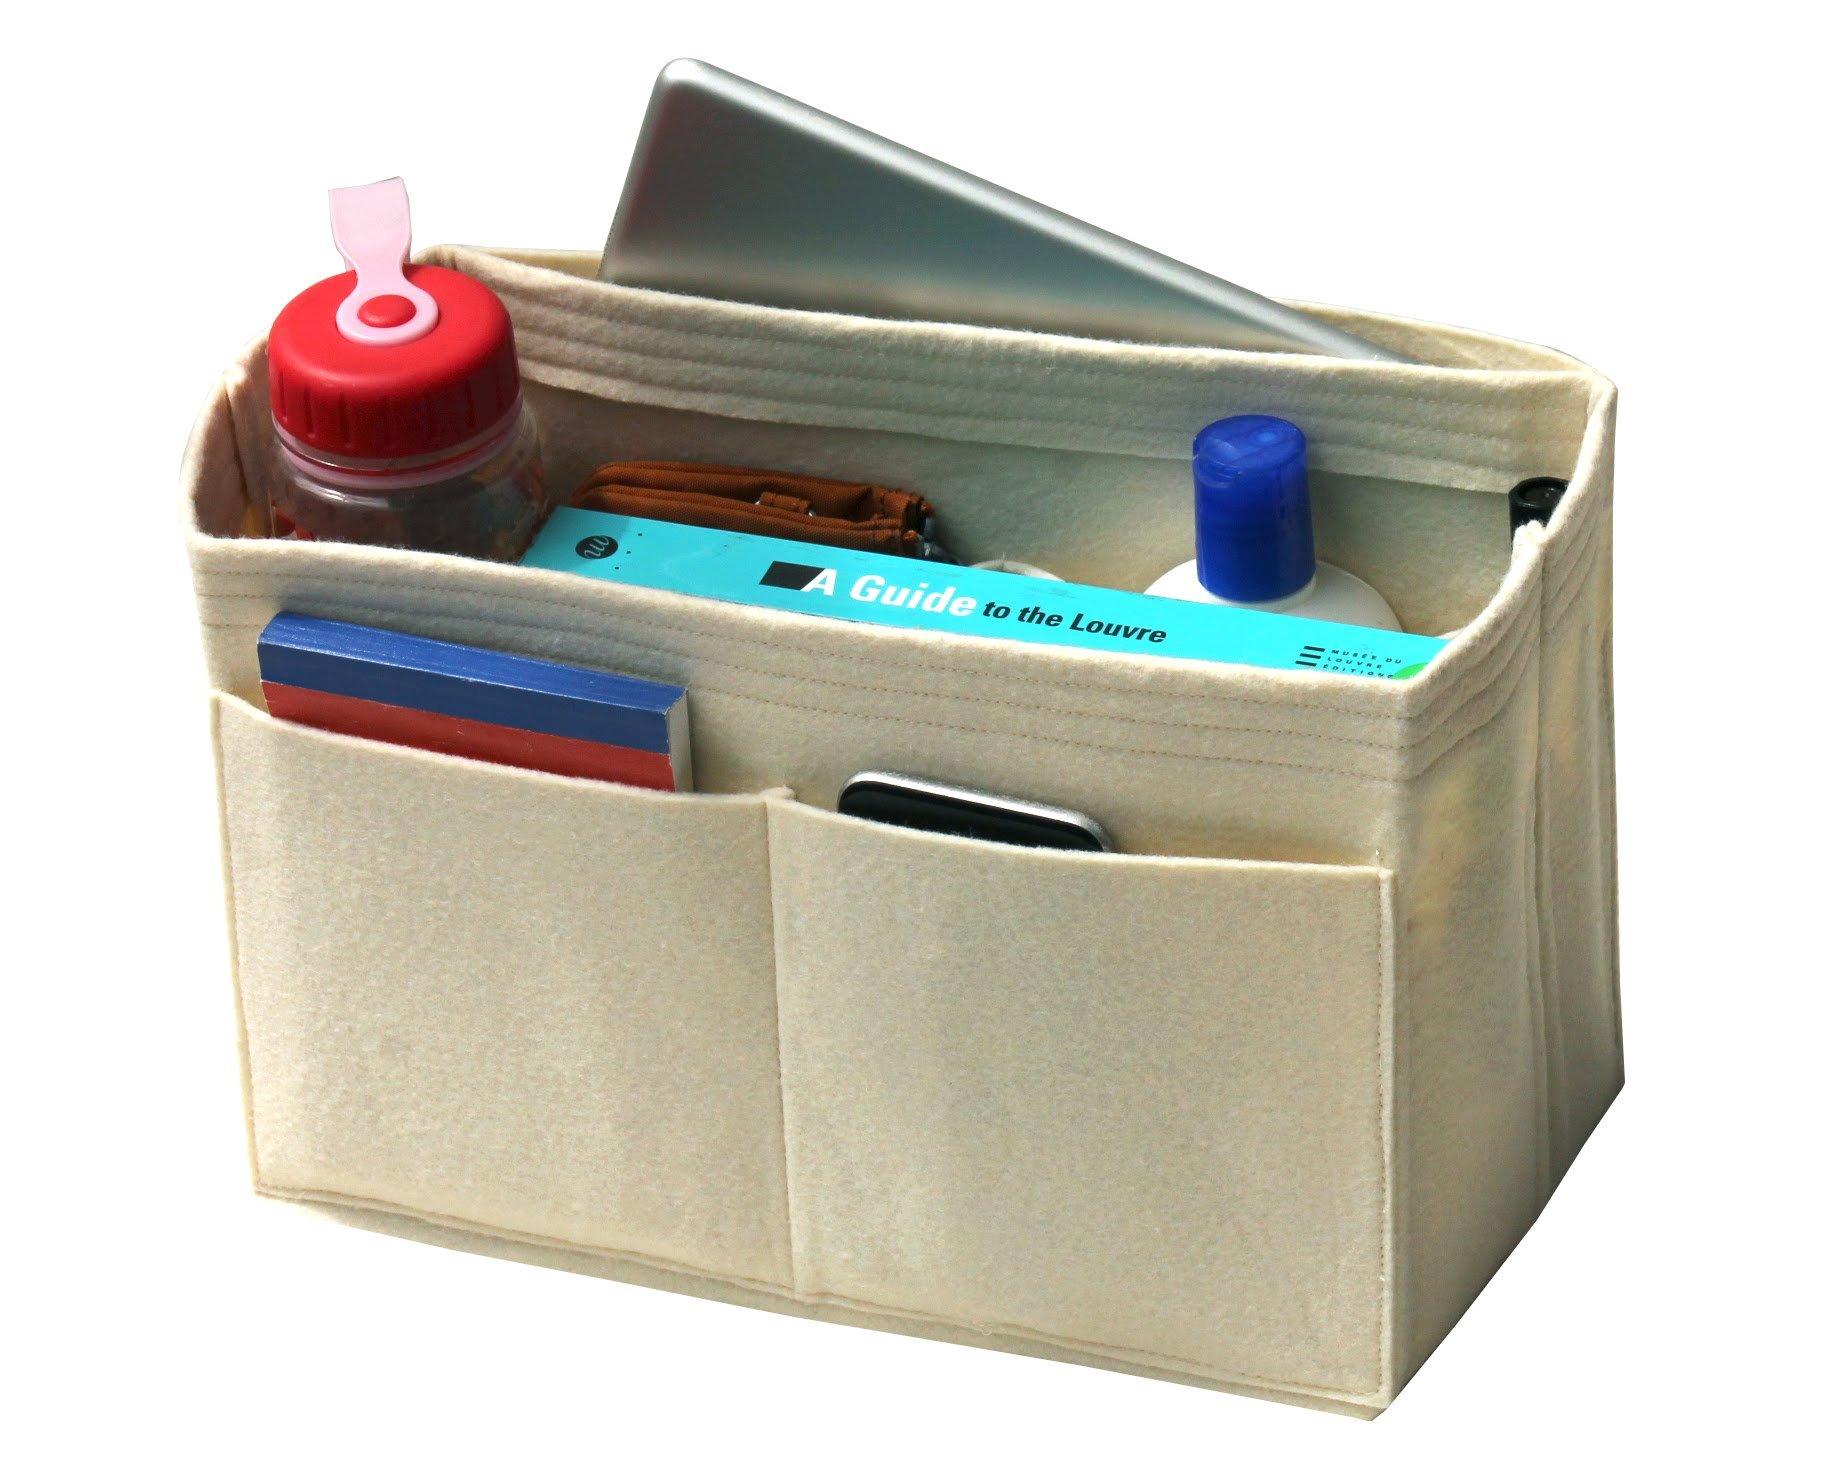 [Fits Various Bags, L.V Her.mes Long.champ Go.yard] Felt Tote Organizer (w/ Milk Water Bottle Holder), Purse Insert, Cosmetic Makeup Diaper Handbag, Belongings Pocket